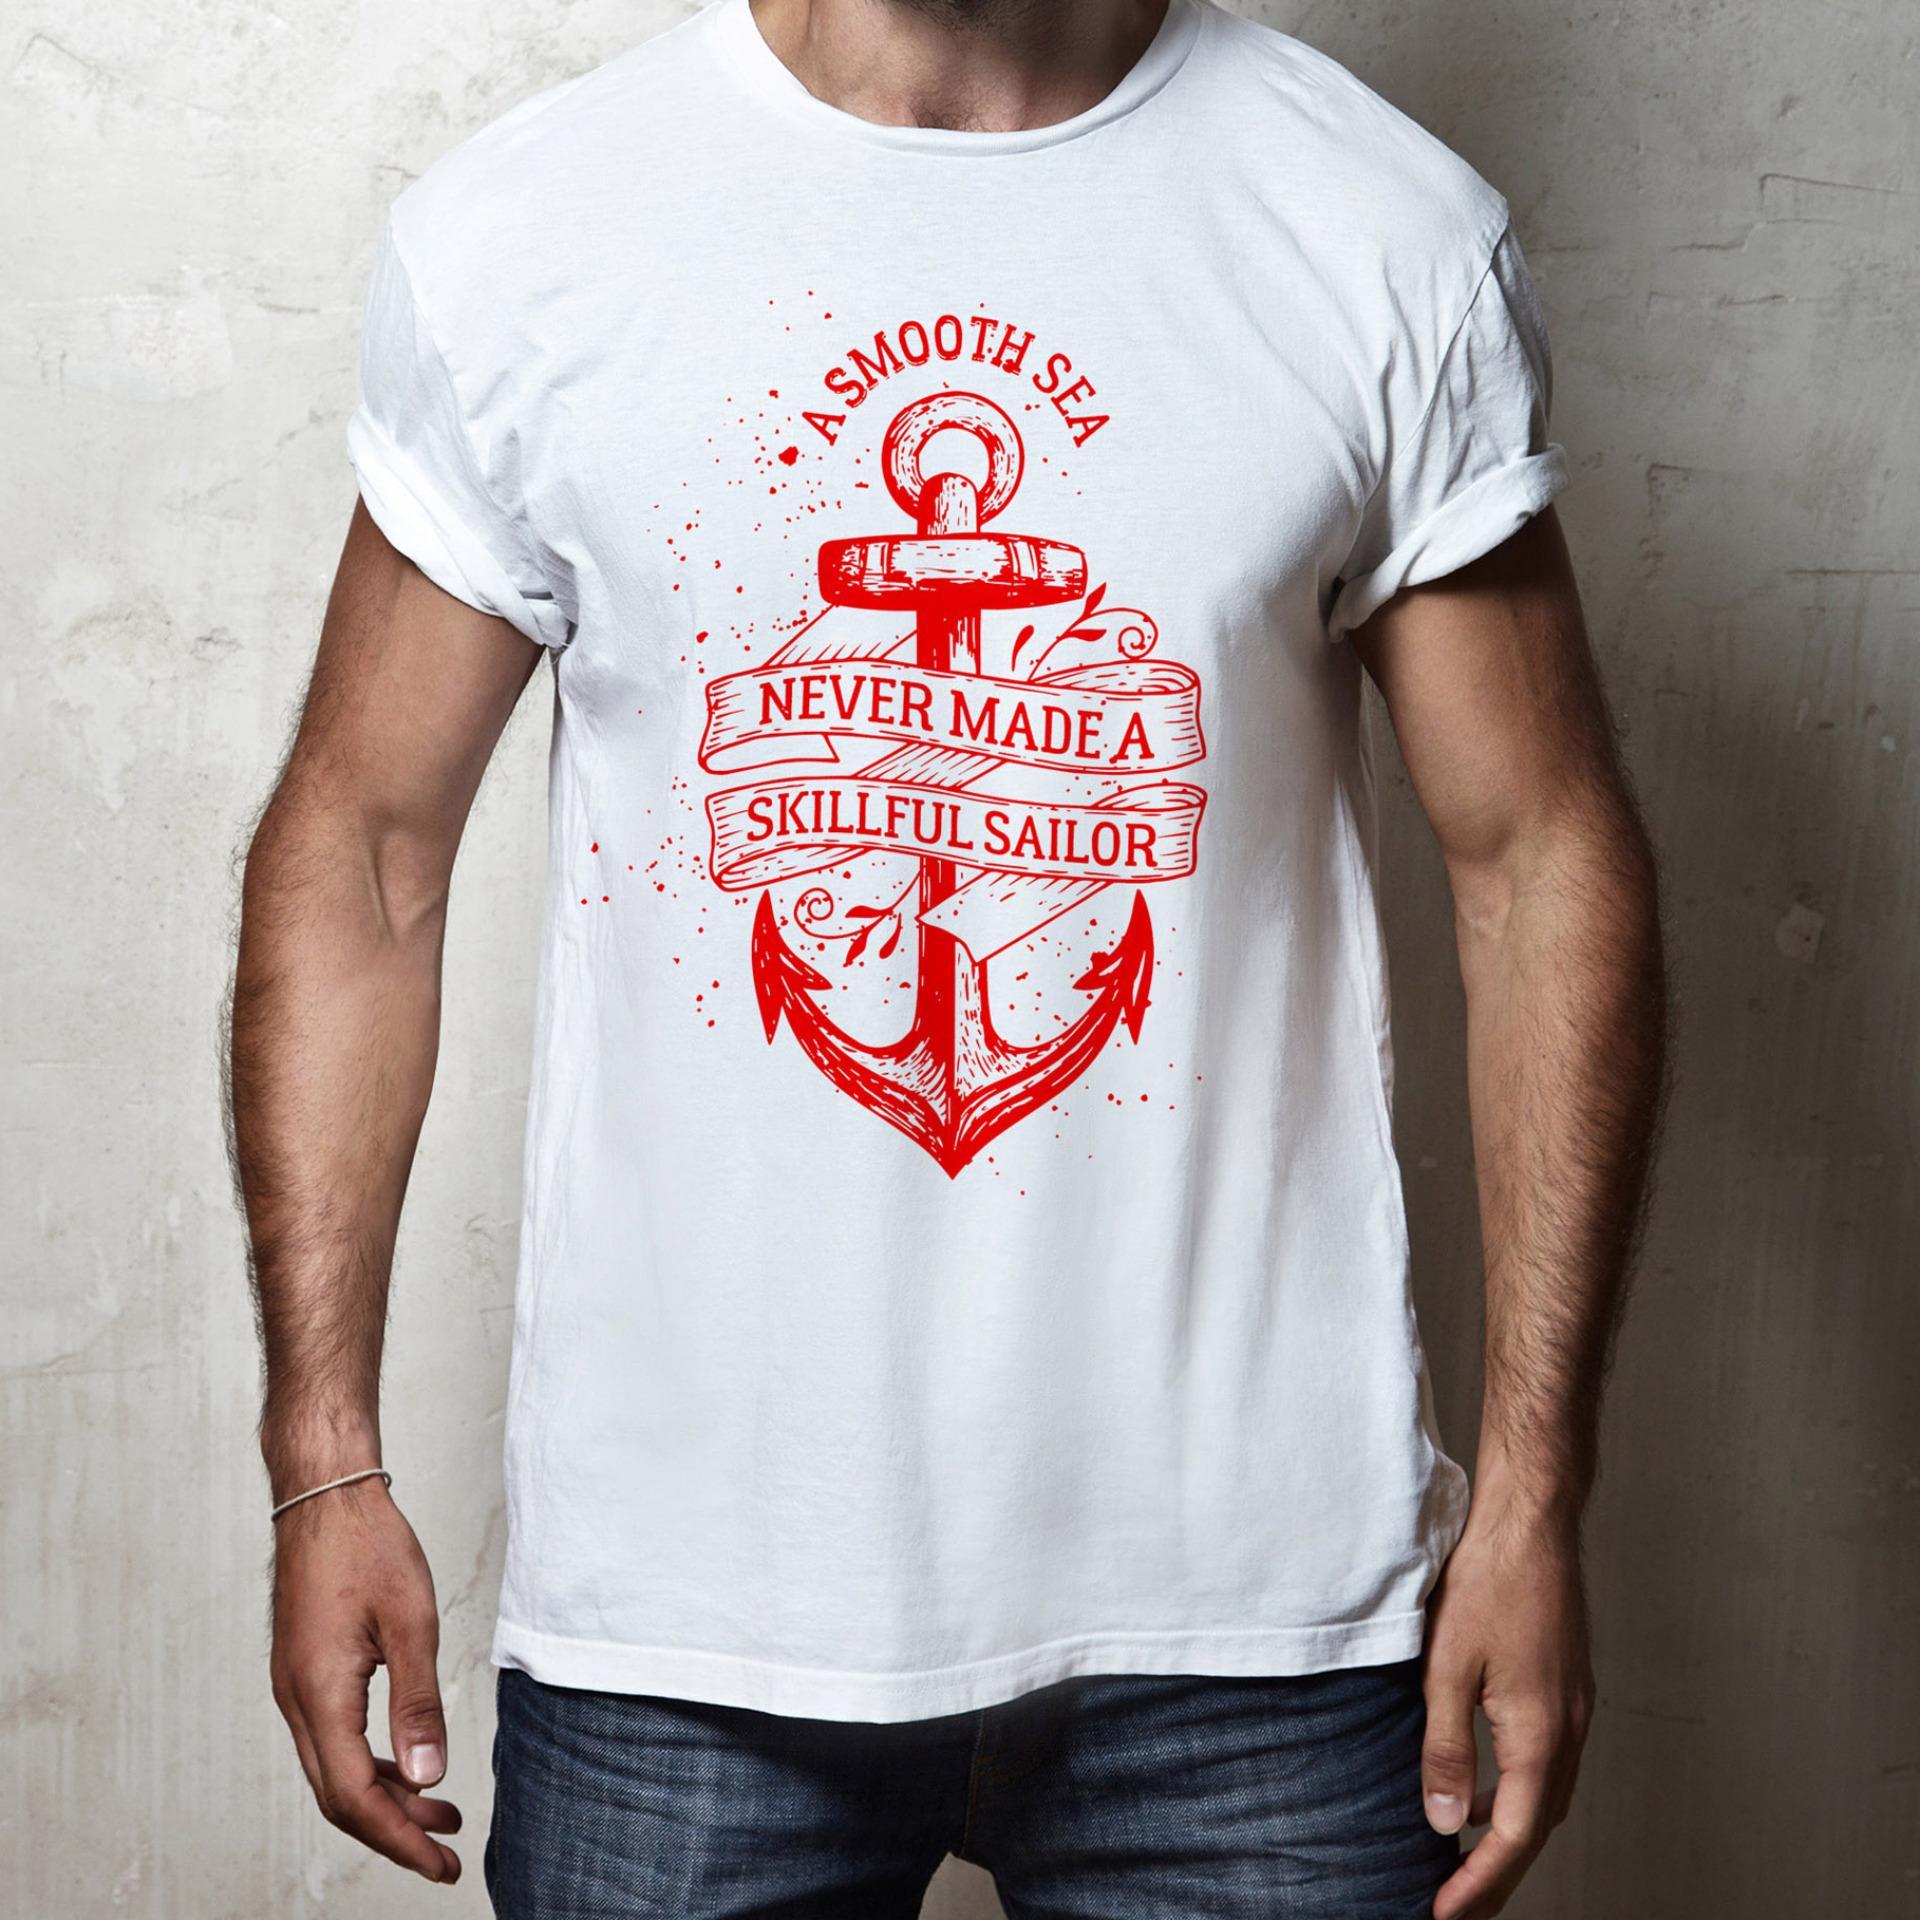 BC Arts / Skillful Sailor Quotes Red / Kaos Pria Wanita / T-shirt Pria Wanita / Kaos Putih / Kaos Distro